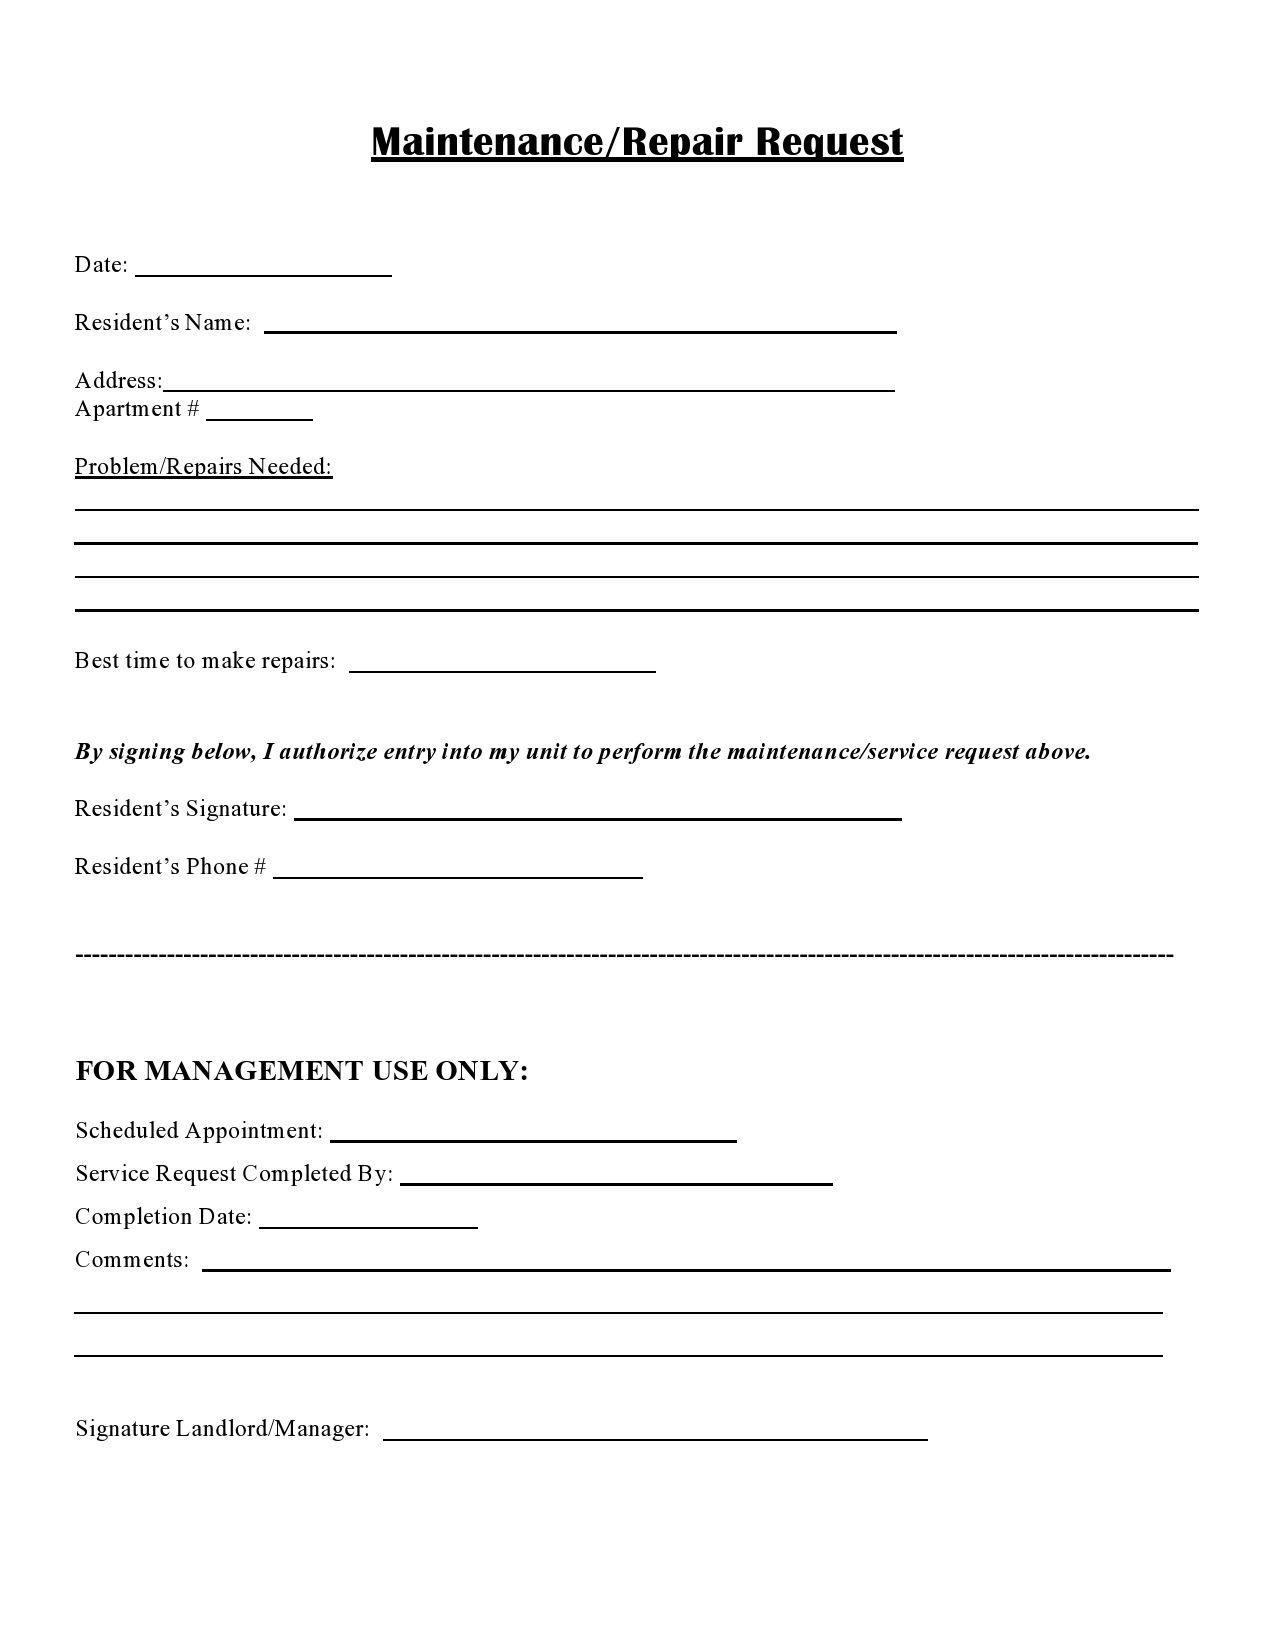 007 Outstanding Maintenance Work Order Template Sample  Form FreeFull